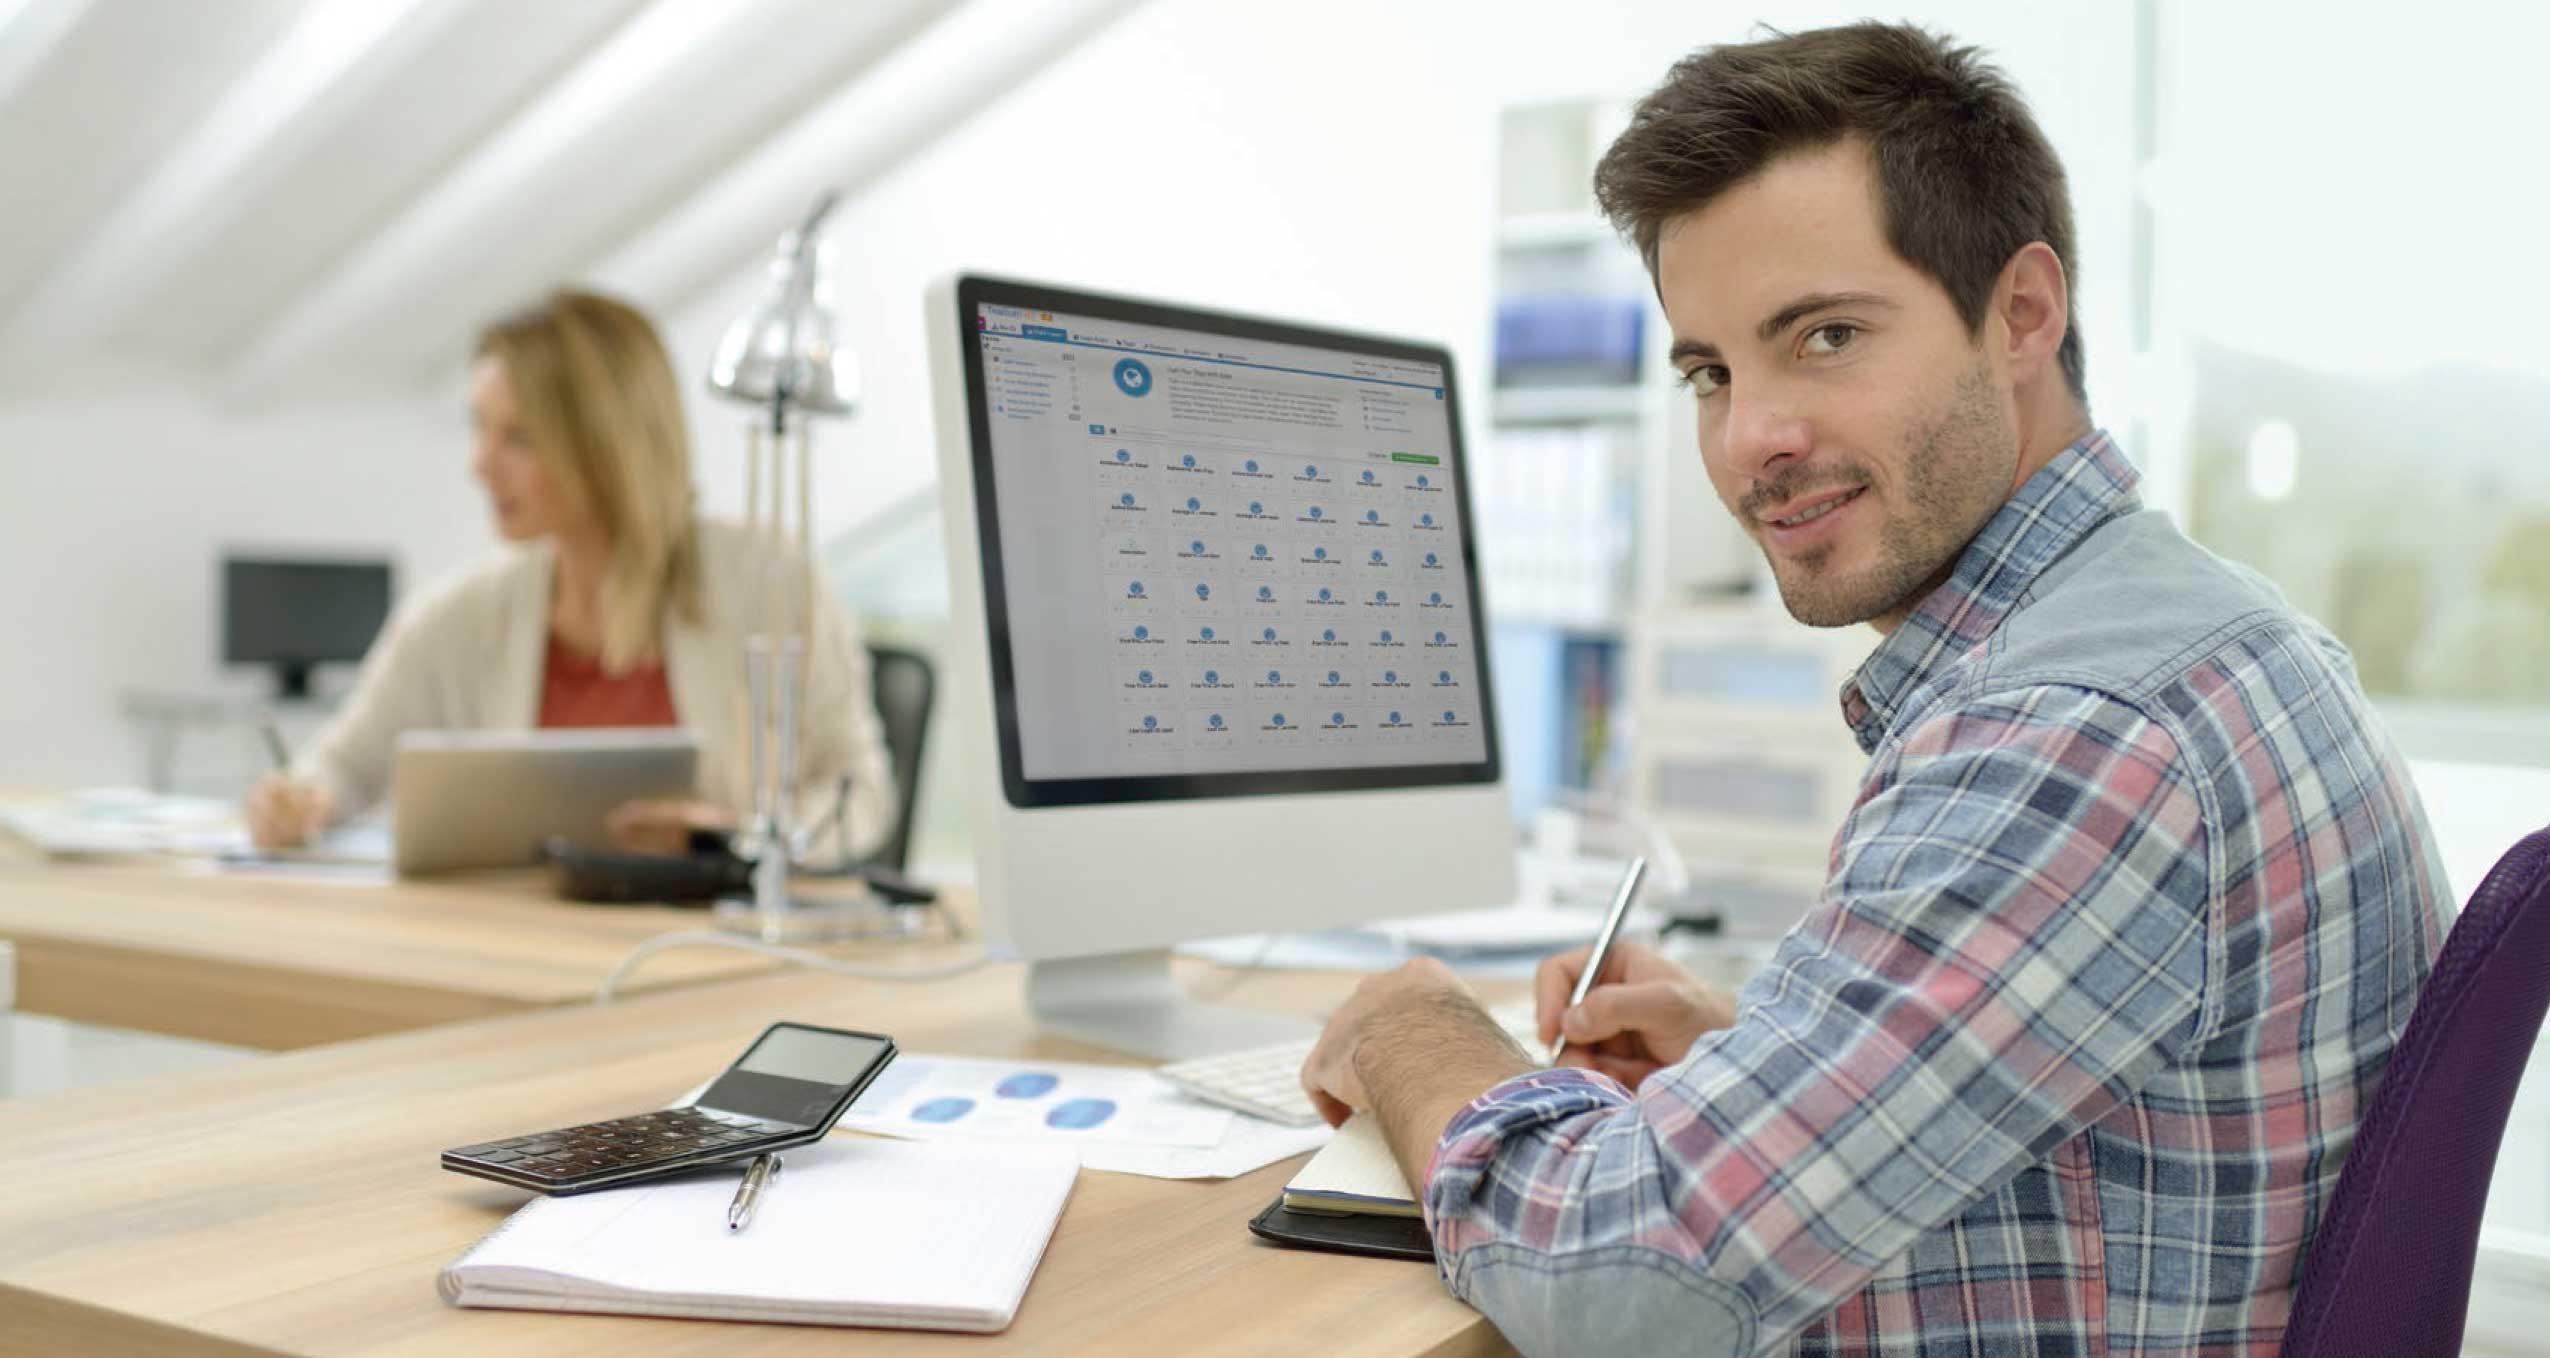 Digital marketer using Tealium iQ